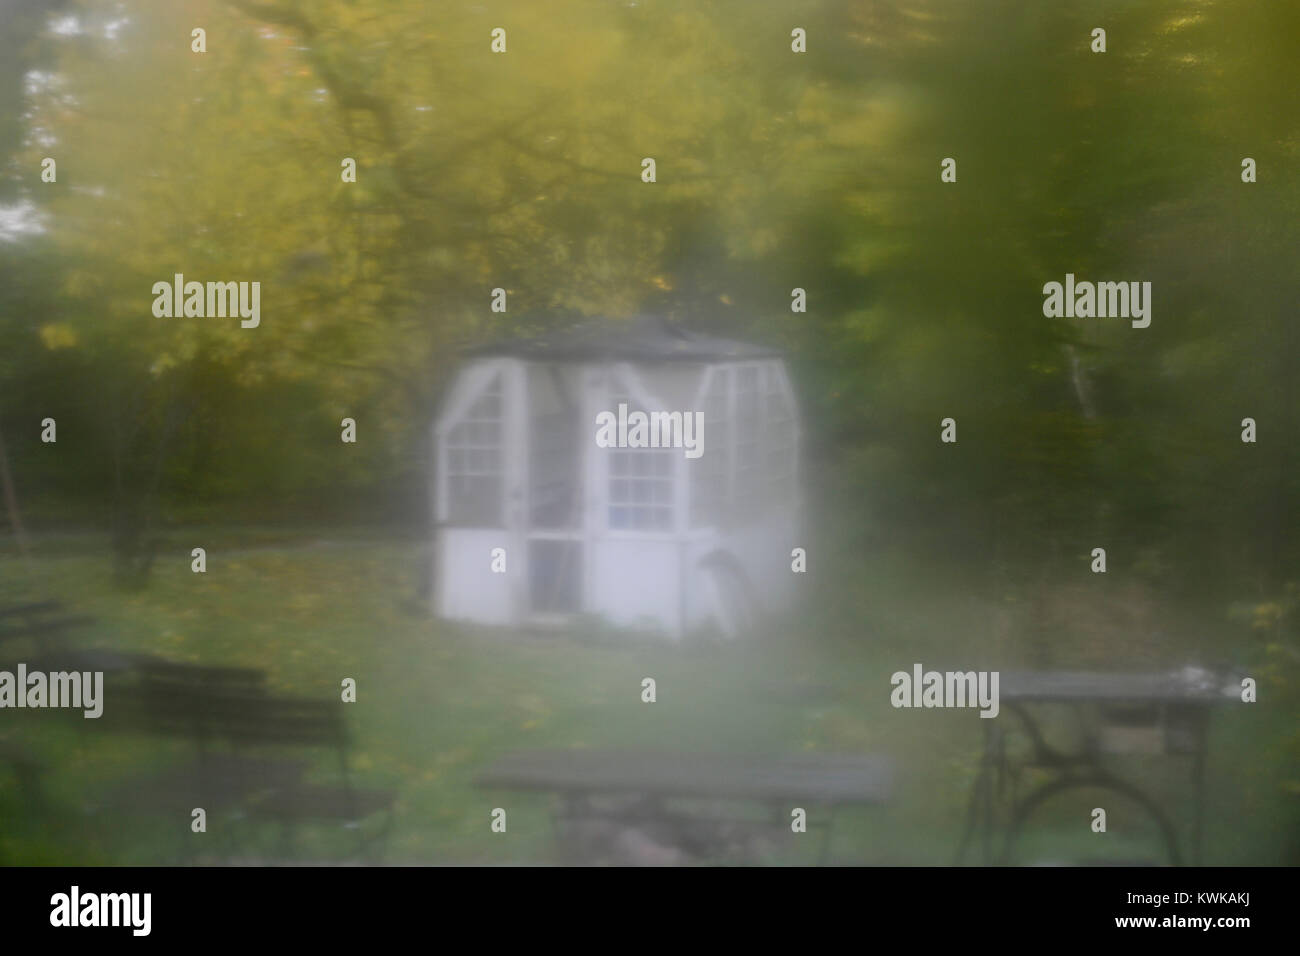 GERMANY, baltic sea, island Ruegen, look at garden pavillon, out of focus, seen through damp window - Stock Image